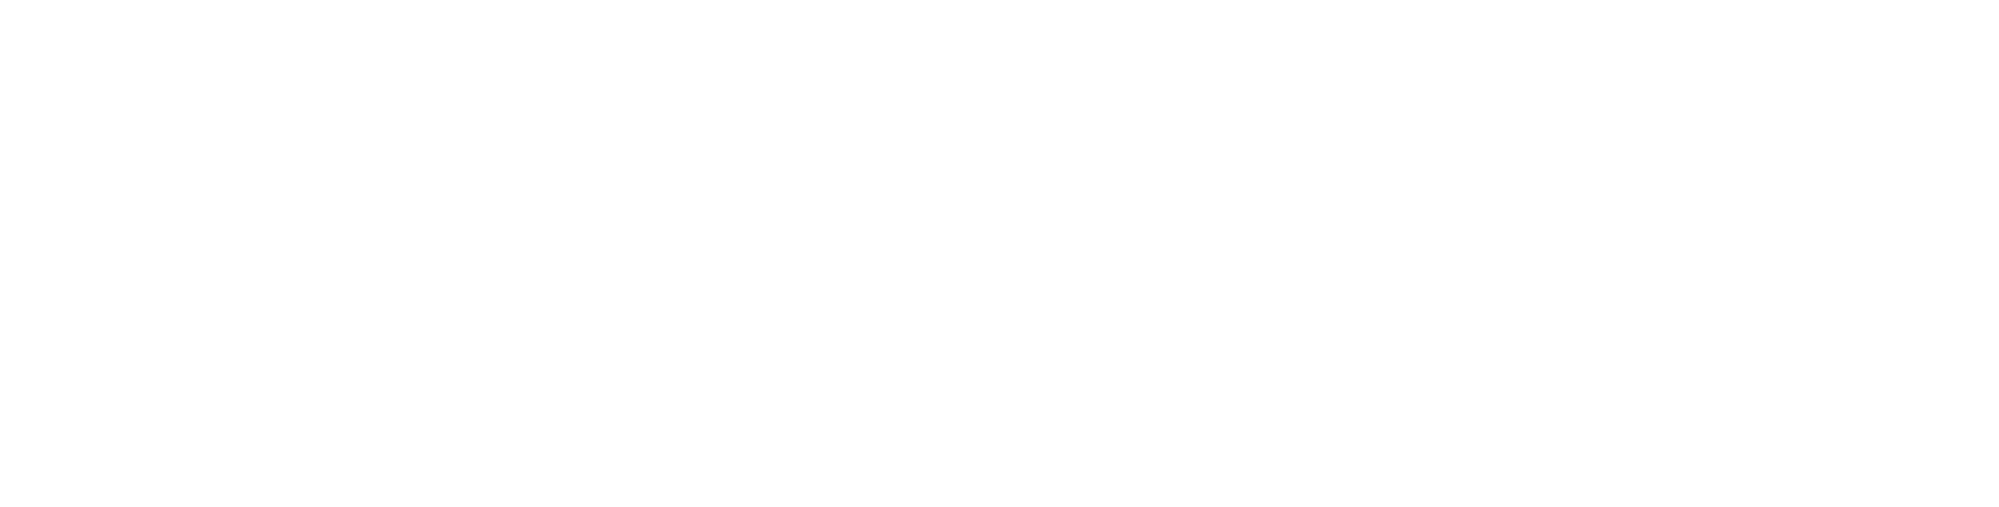 cobranded-logo-01